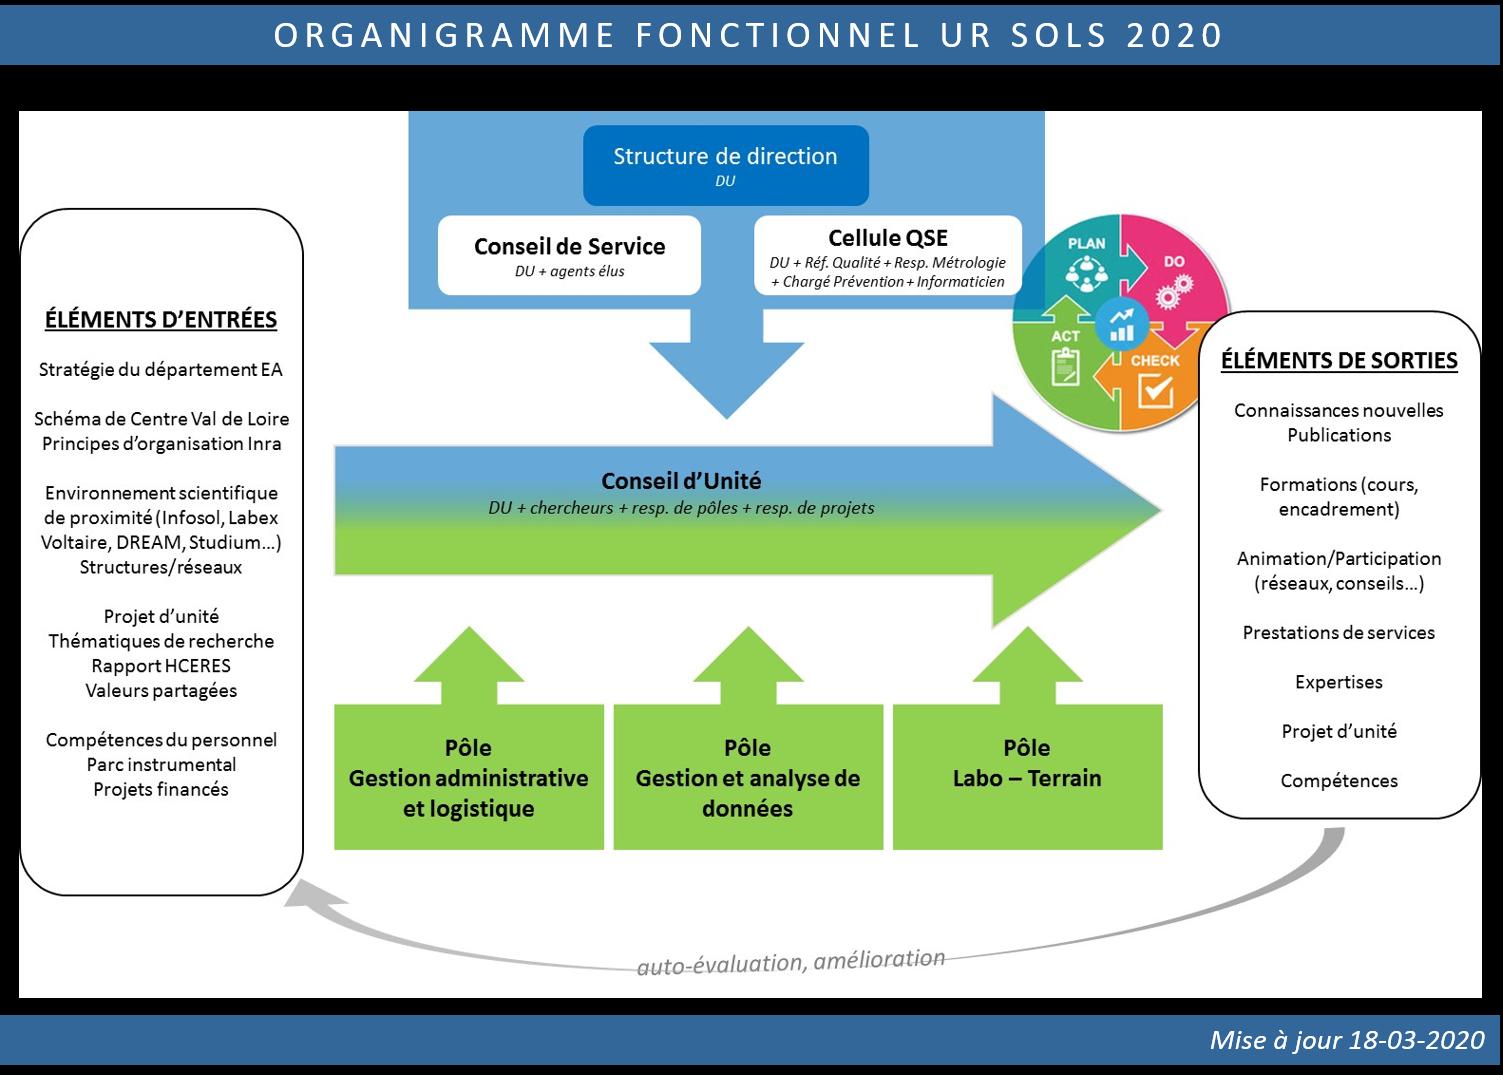 Organigramme fonctionnel 2020